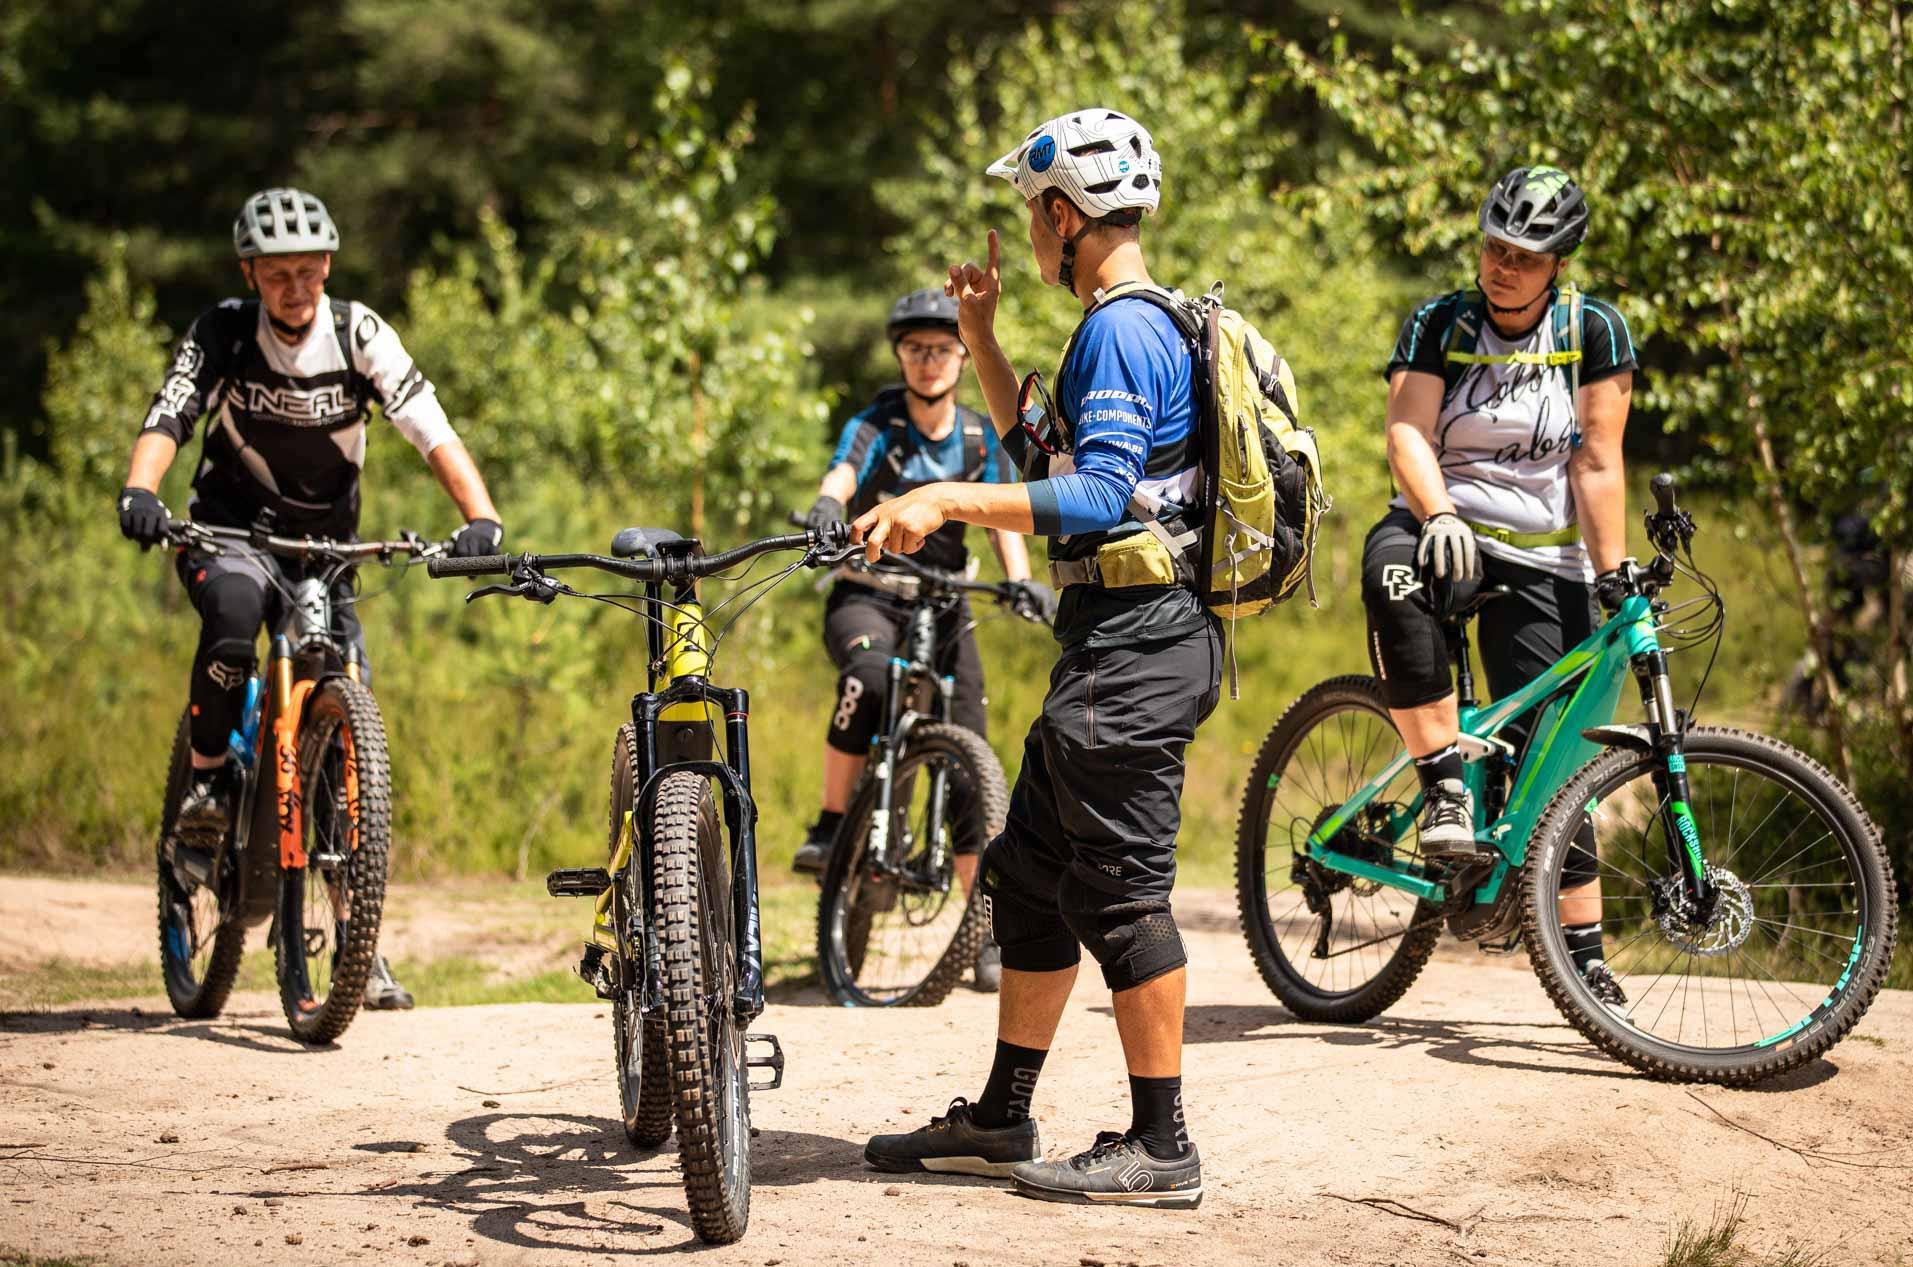 eMTB Einsteiger Kurs Nagold - eBike Training - Rock my Trail